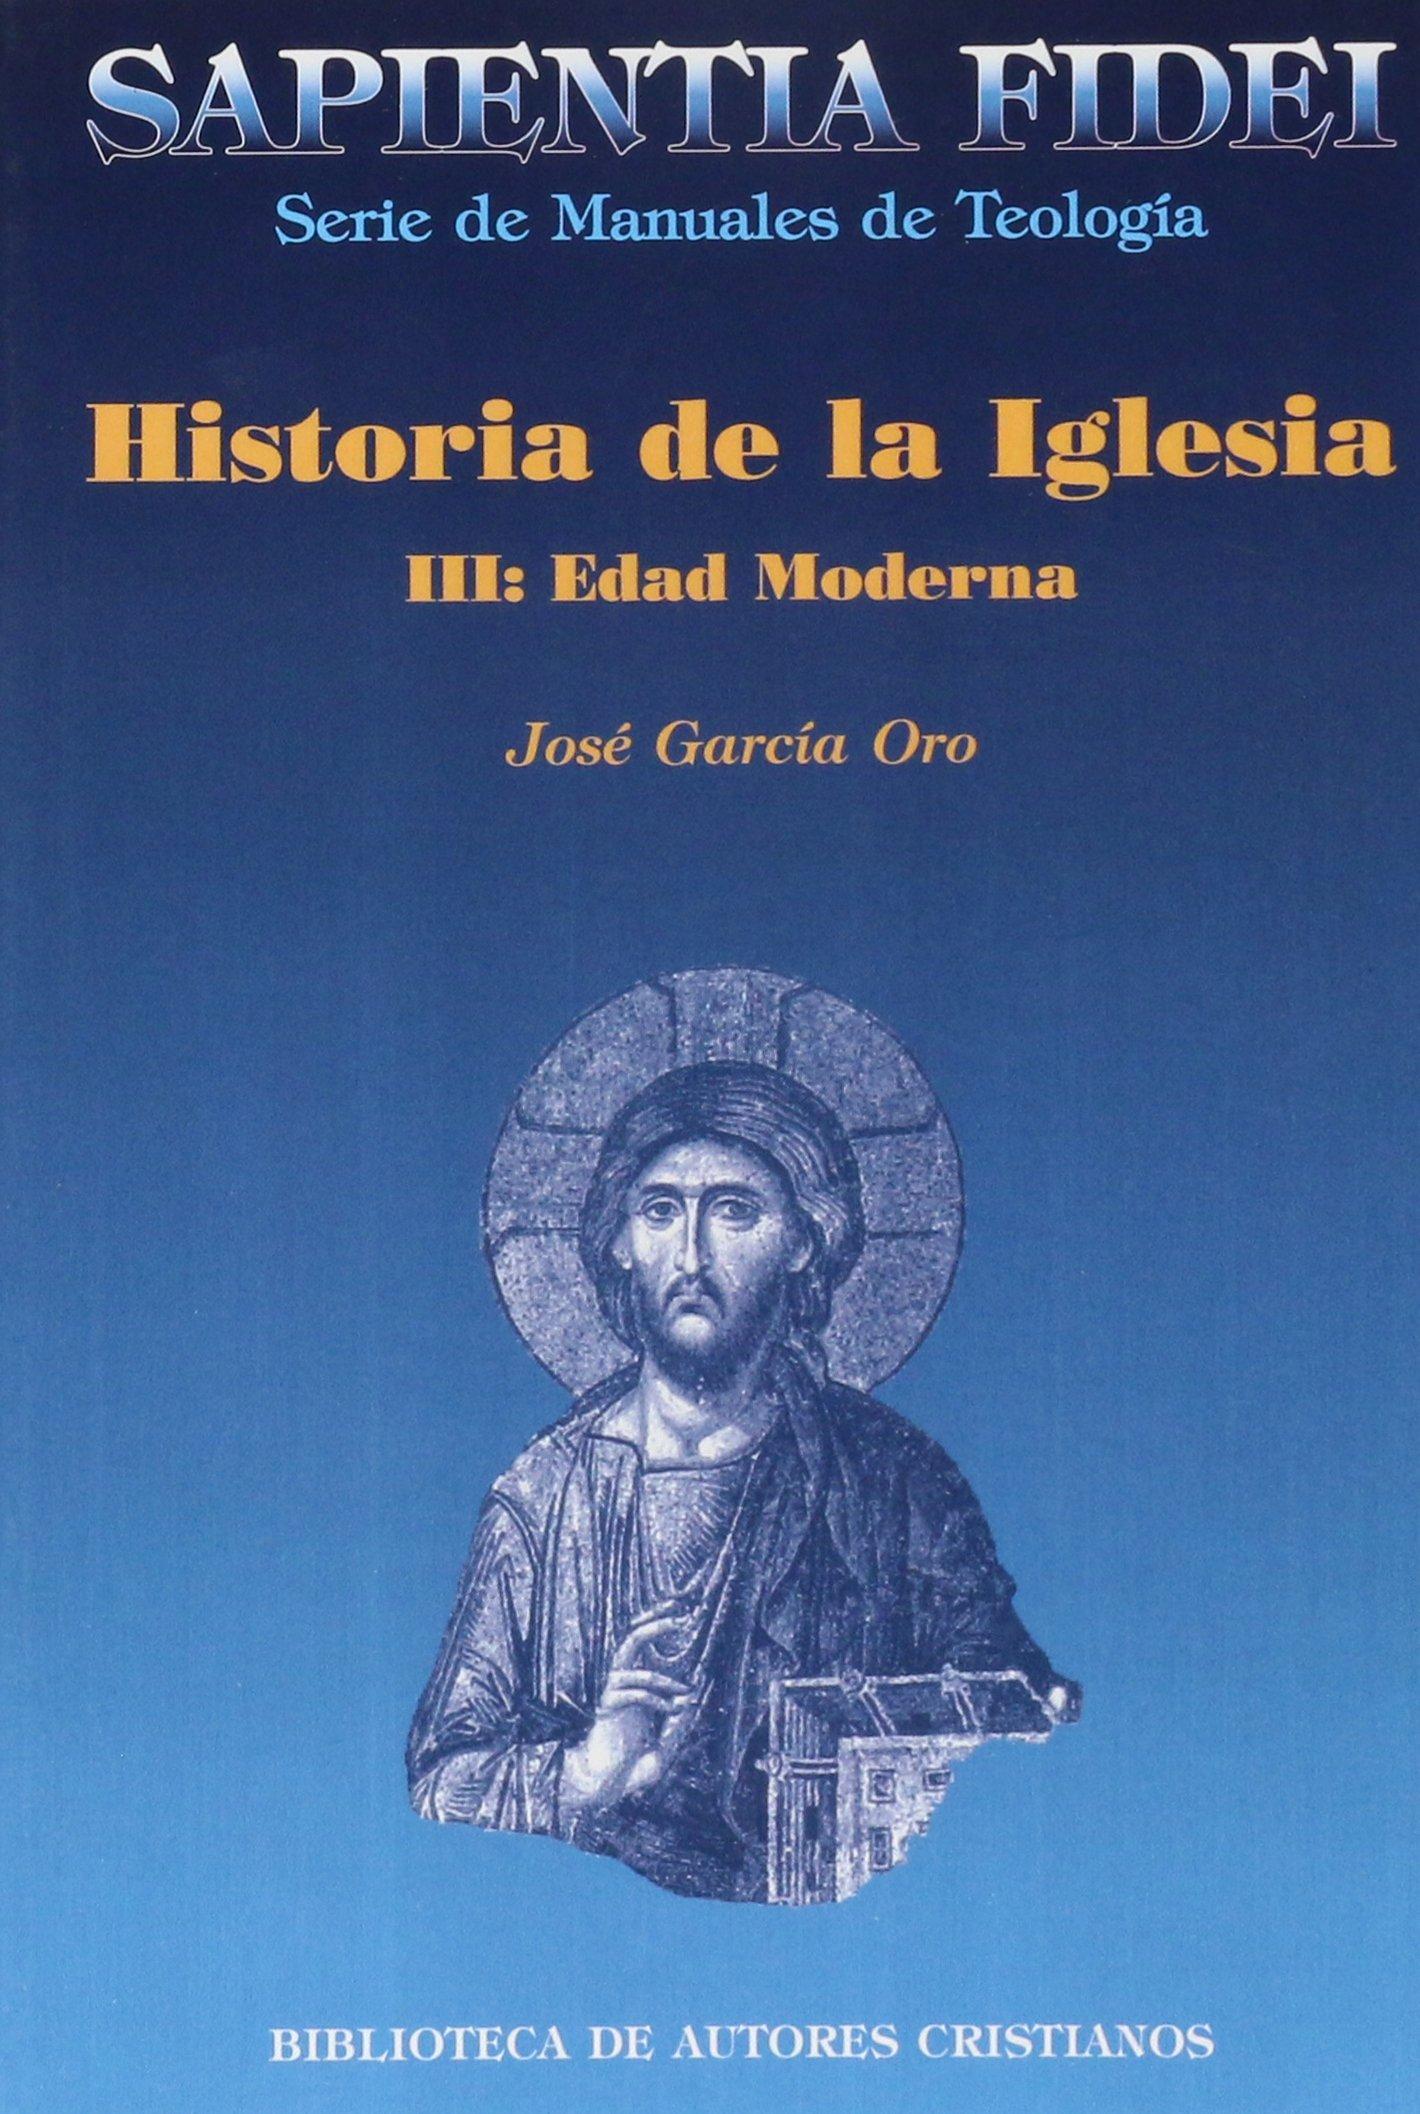 Historia de la Iglesia. III: Edad Moderna: 3 SAPIENTIA FIDEI ...